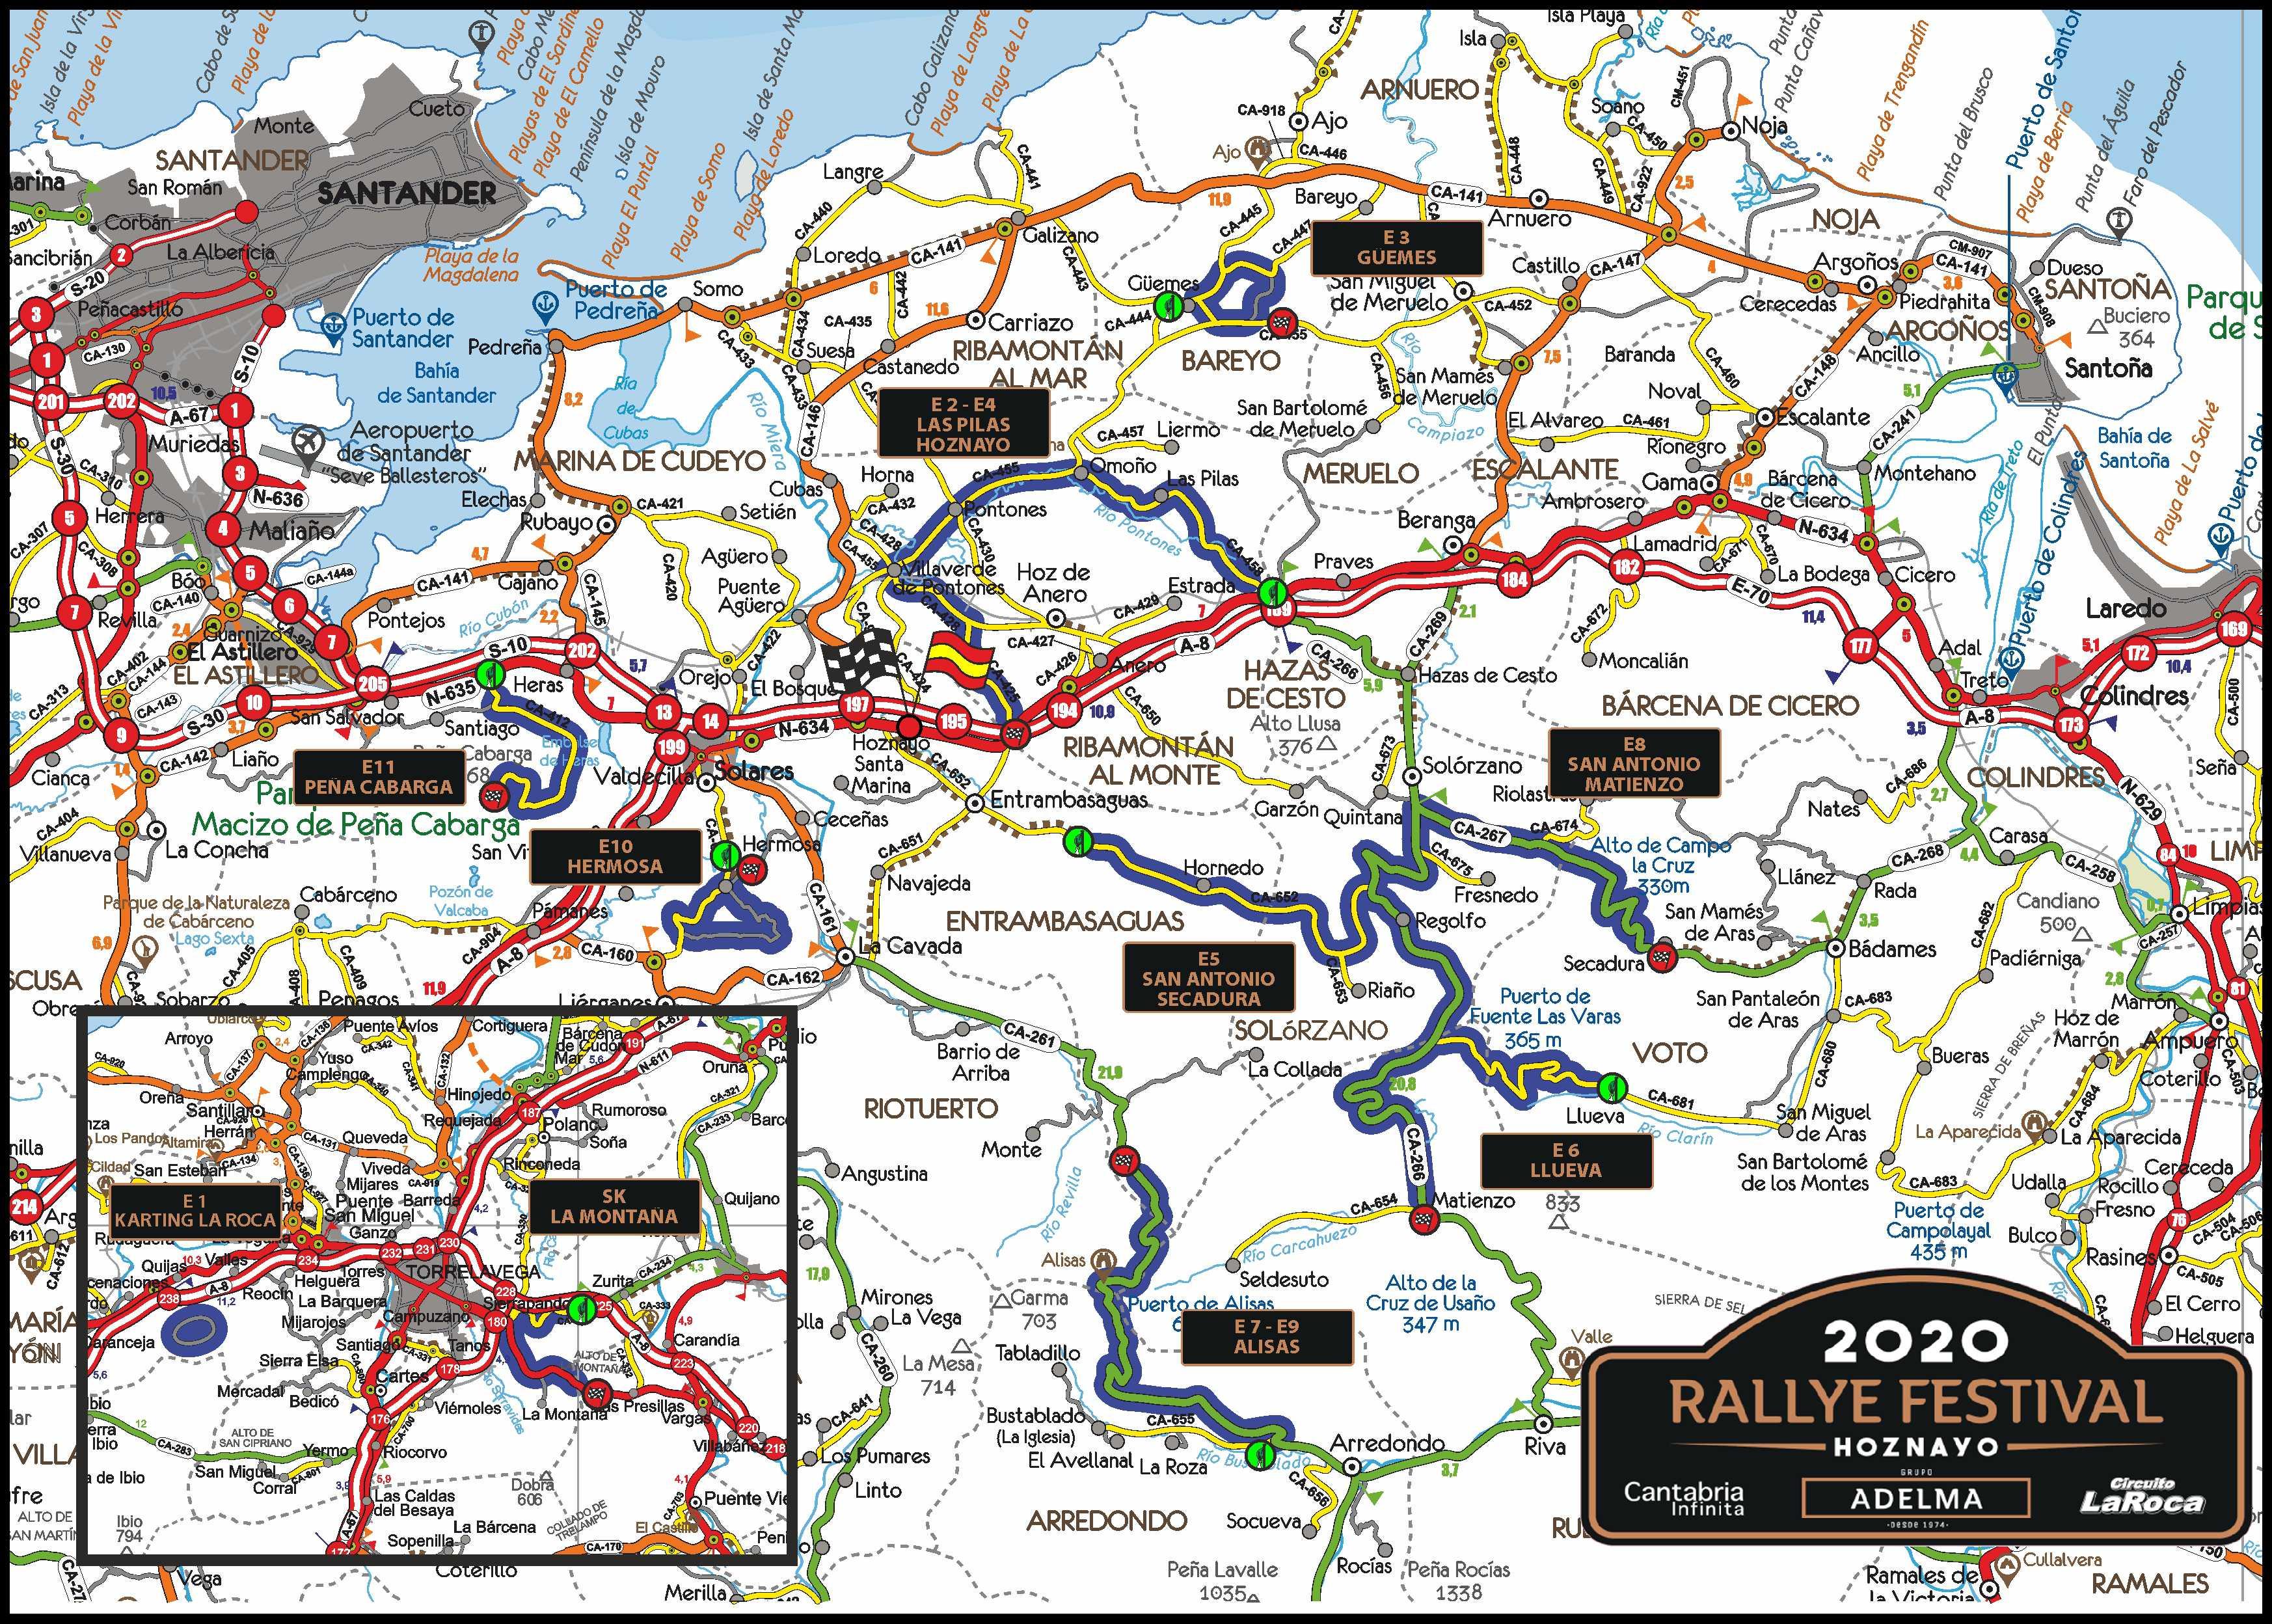 Rallye Festival Hoznayo 2021 [16-18 Septiembre] Mapa